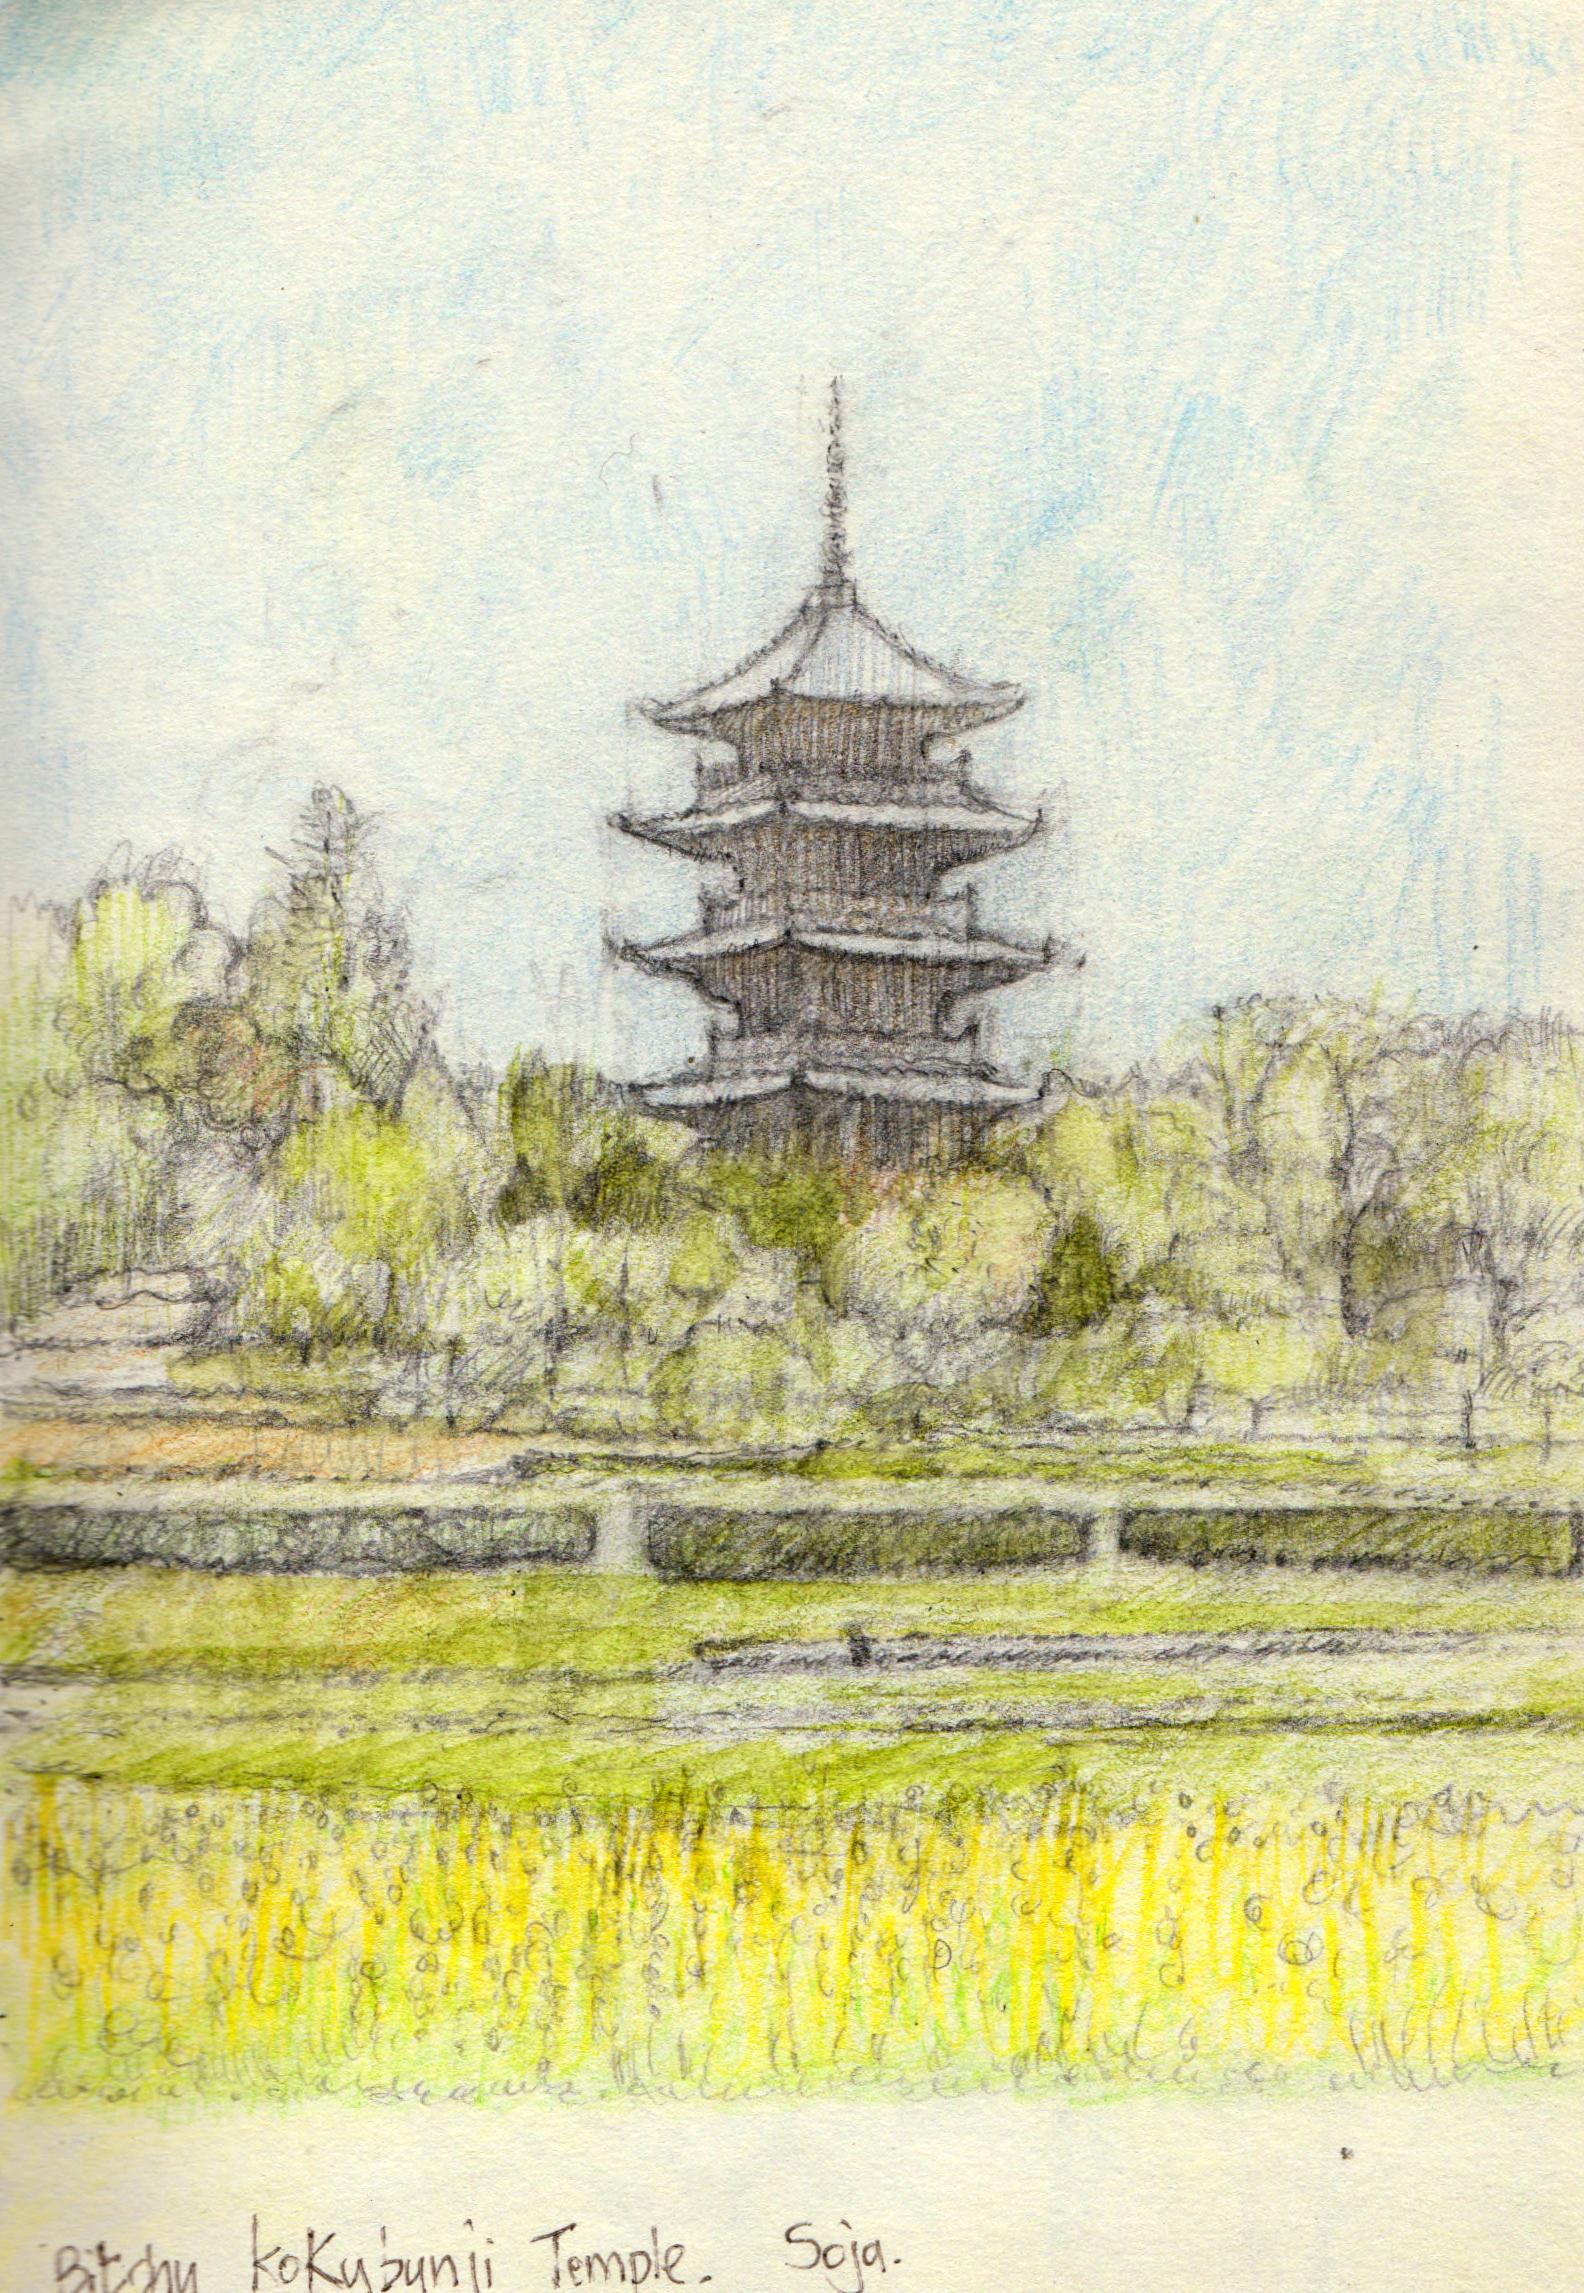 Soja Japan